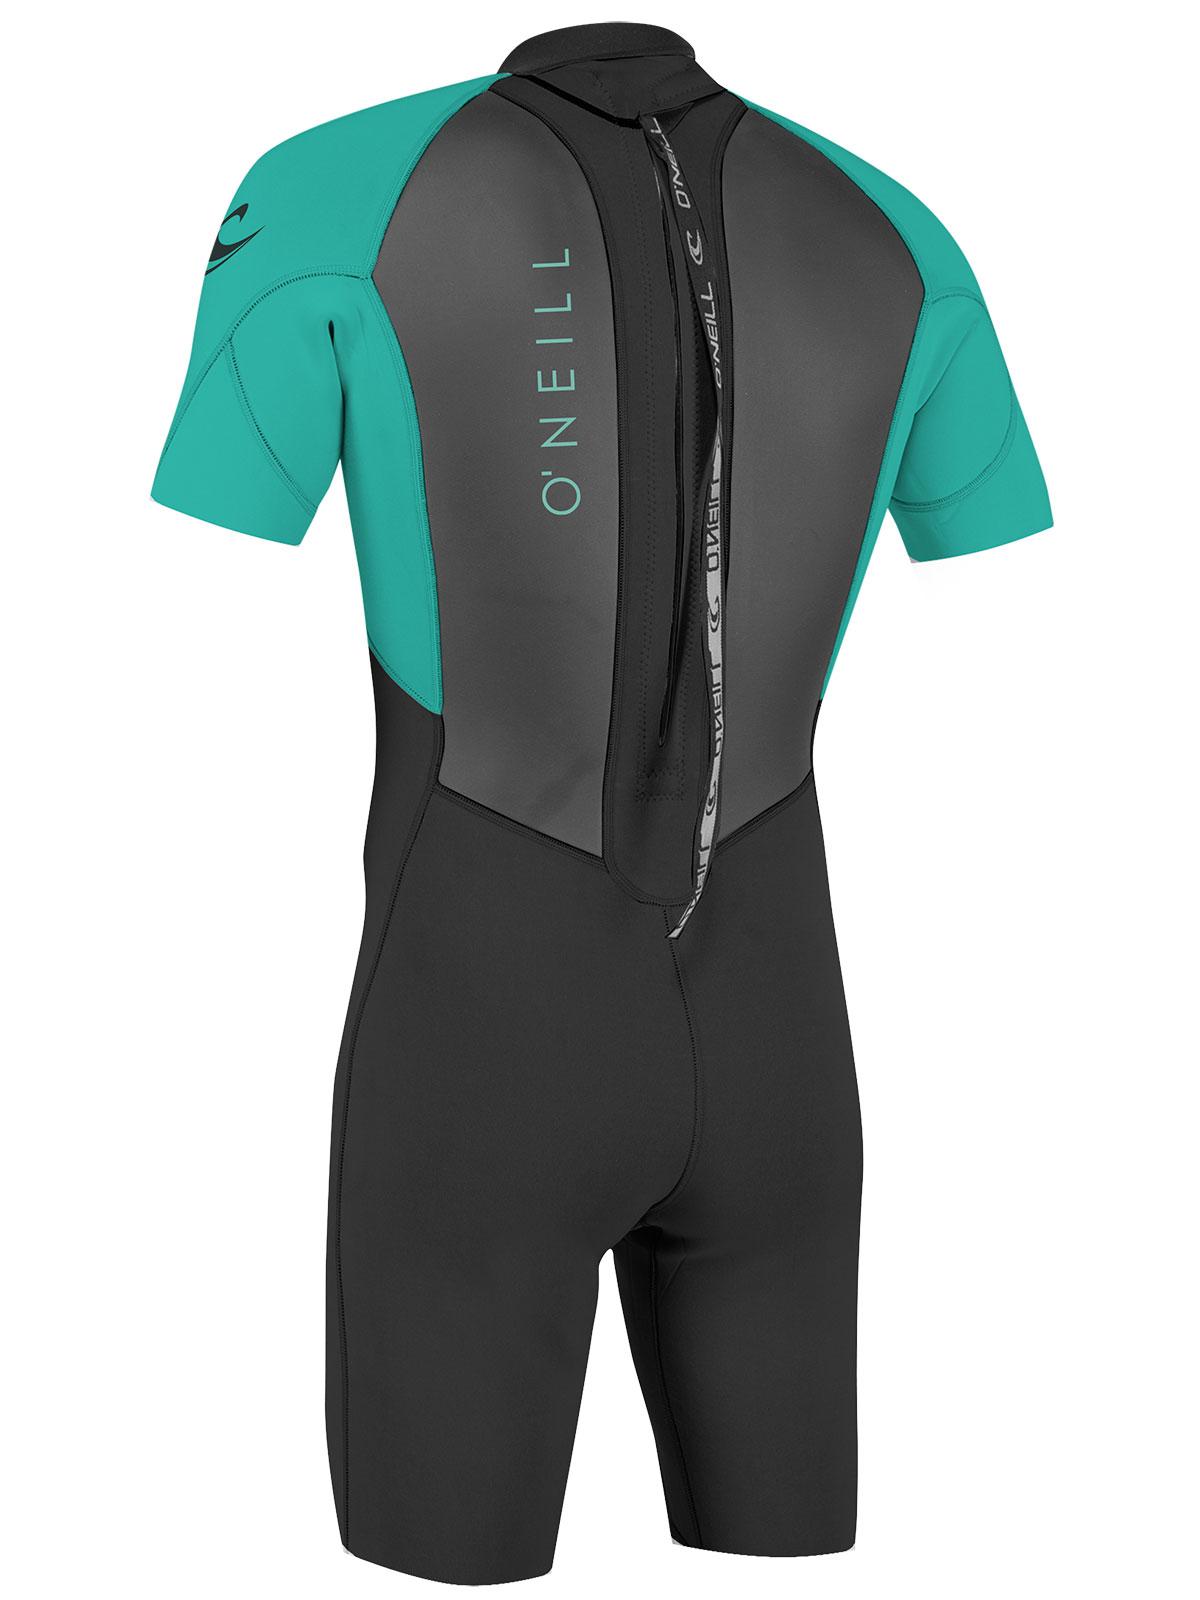 O/'Neill Reactor Kids 2mm Neoprene Shorty Wetsuit Spring Suit Surf Snorkel Swim